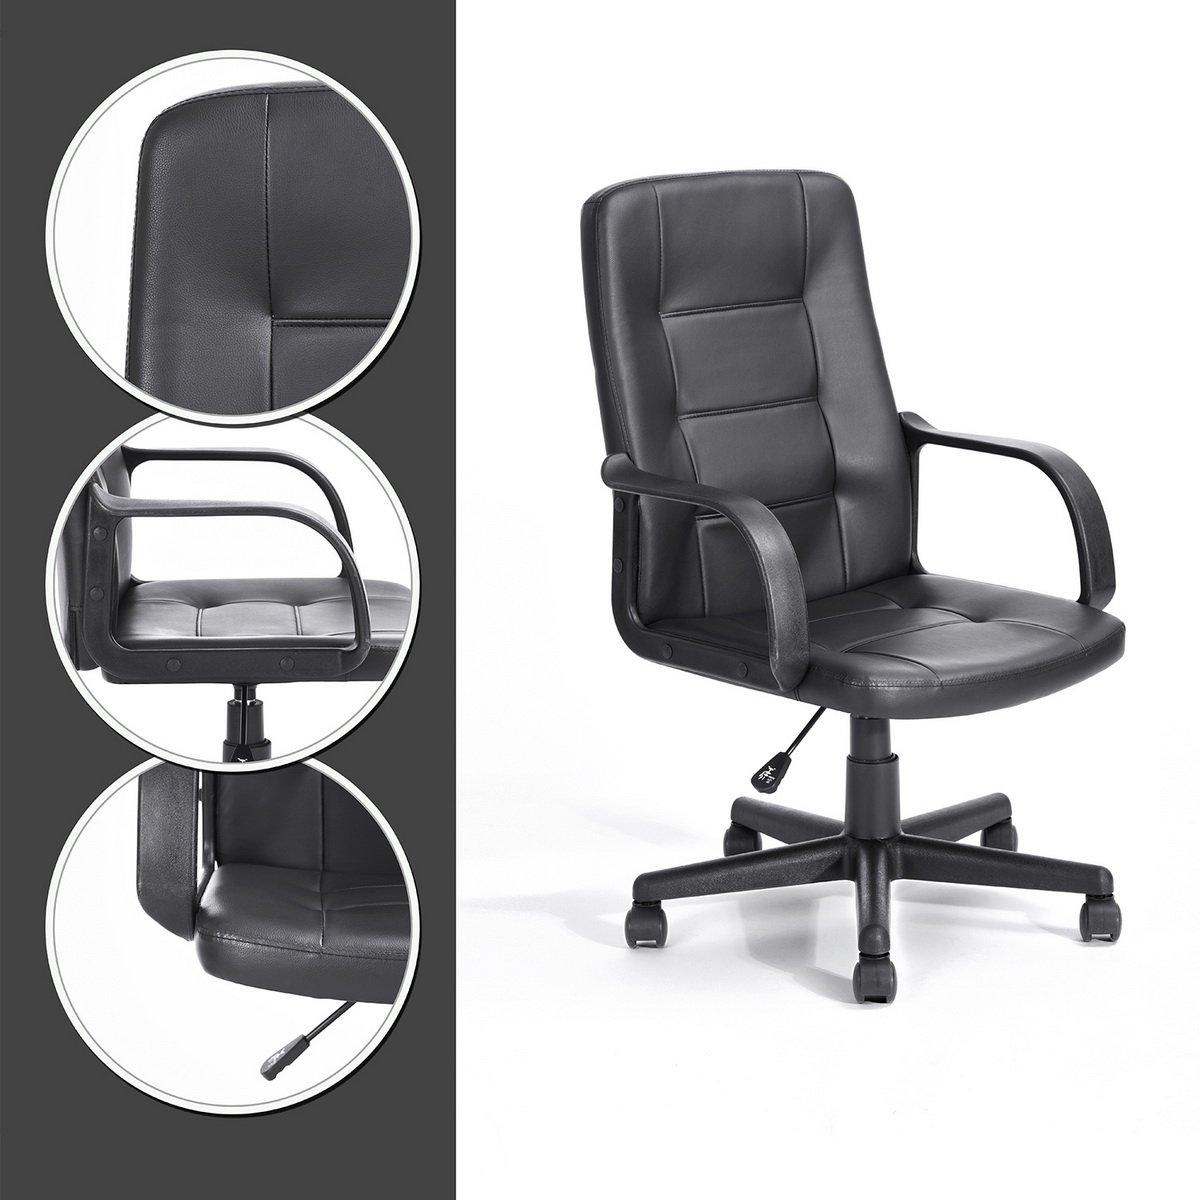 Navy Blau Furniture n.b.f Sessel Bürostuhl, Computer aus PU Leder mit 5 Rollen Drehbar Komfortabel, Verstellbar - Haut dossier